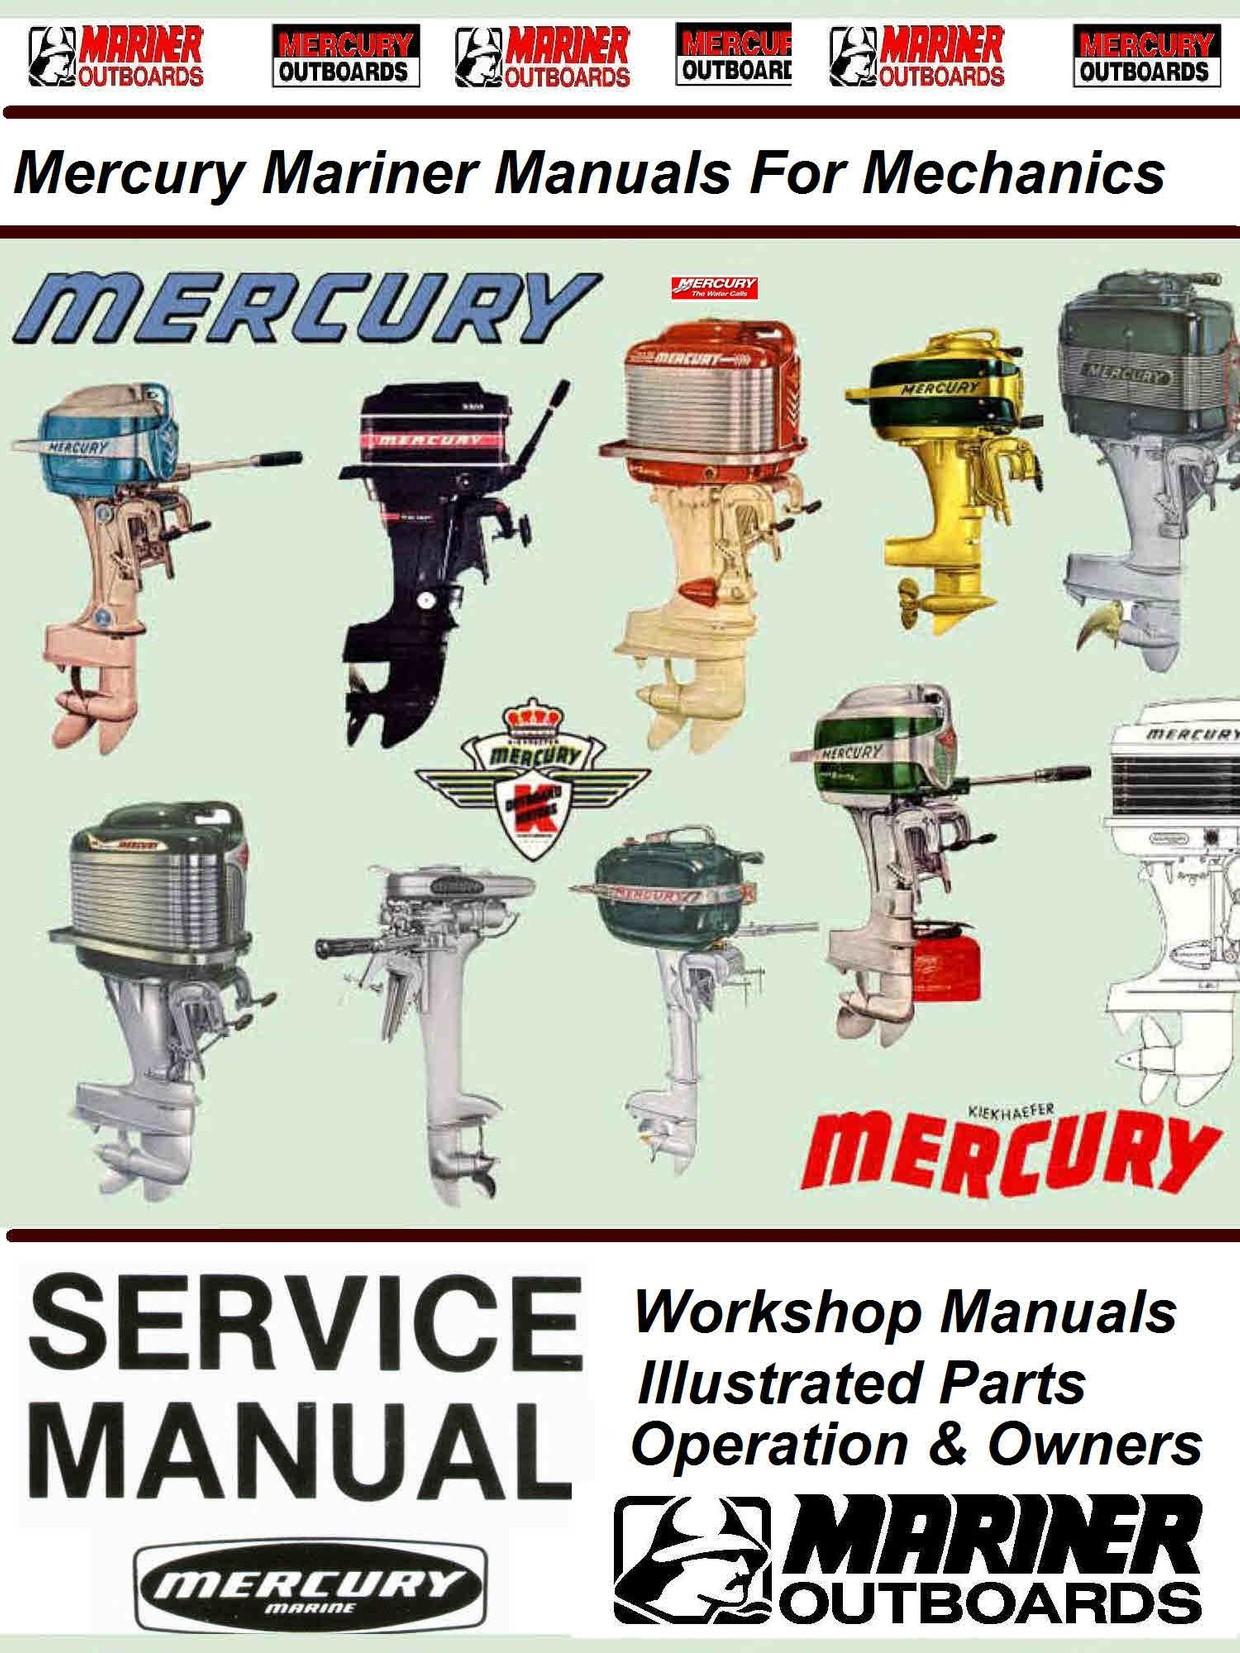 Mercury Mariner Vintage Service Manuals For Mechanic Themanualman